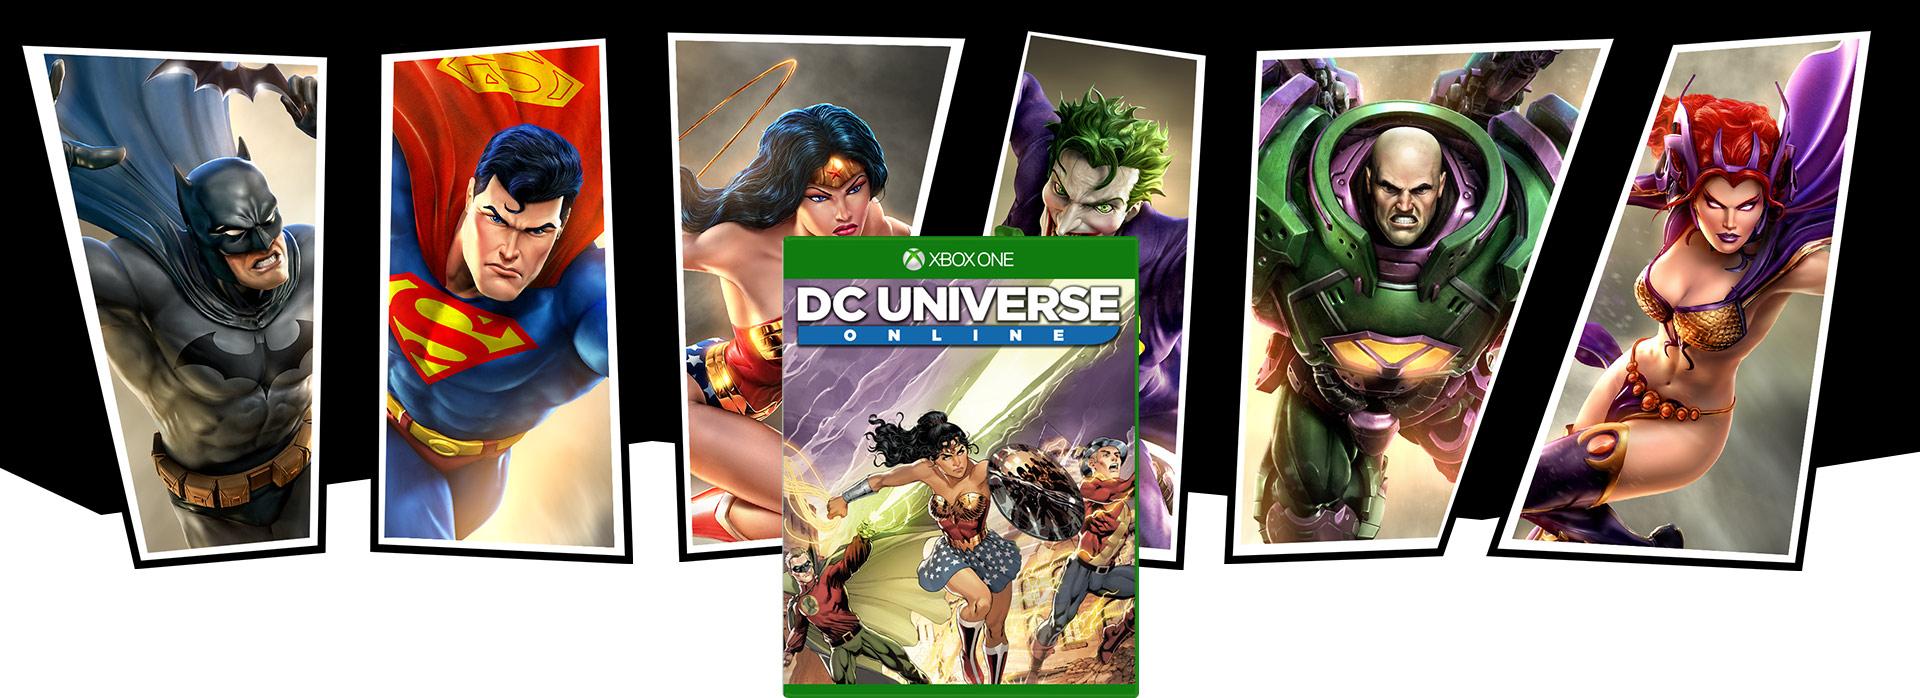 DC Universe Online Boxshot